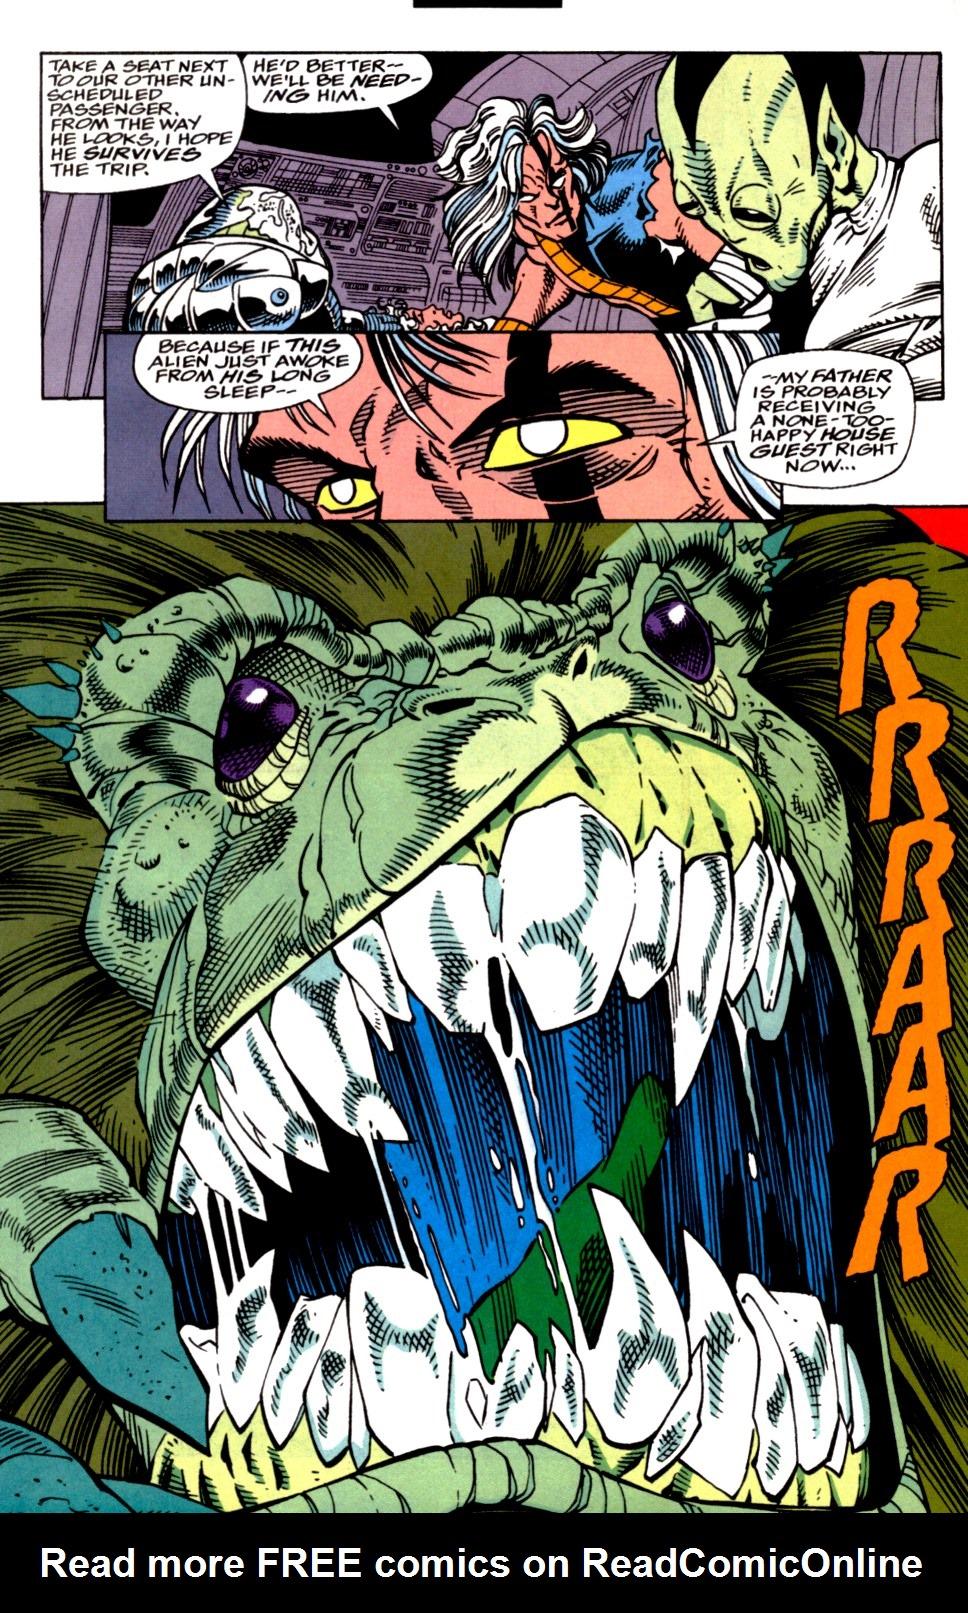 Read online Blackwulf comic -  Issue #4 - 12